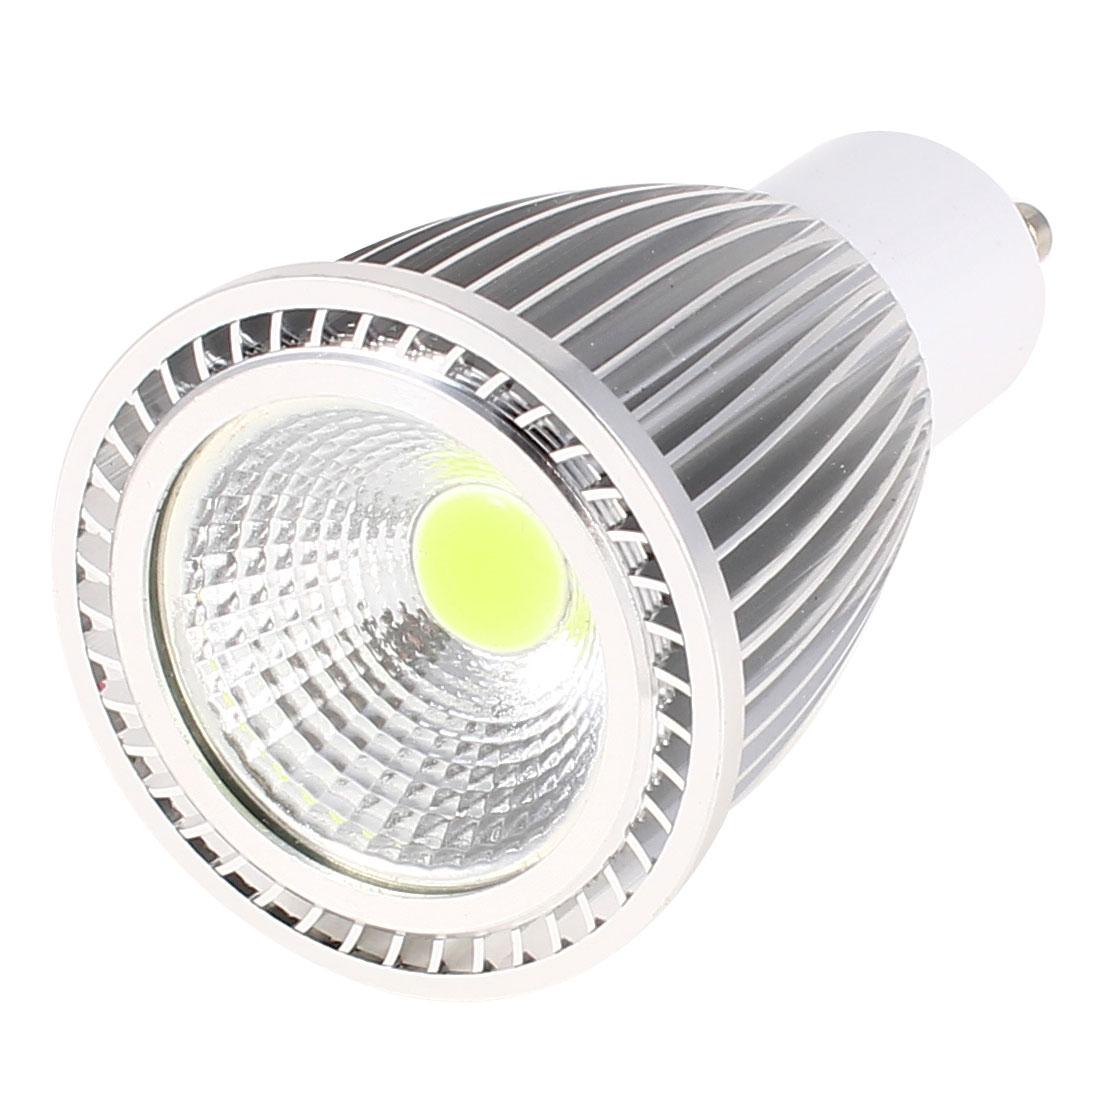 AC 85-265V GU10 Socket 7W White LED Light Energy Saving COB Spotlight Bulb